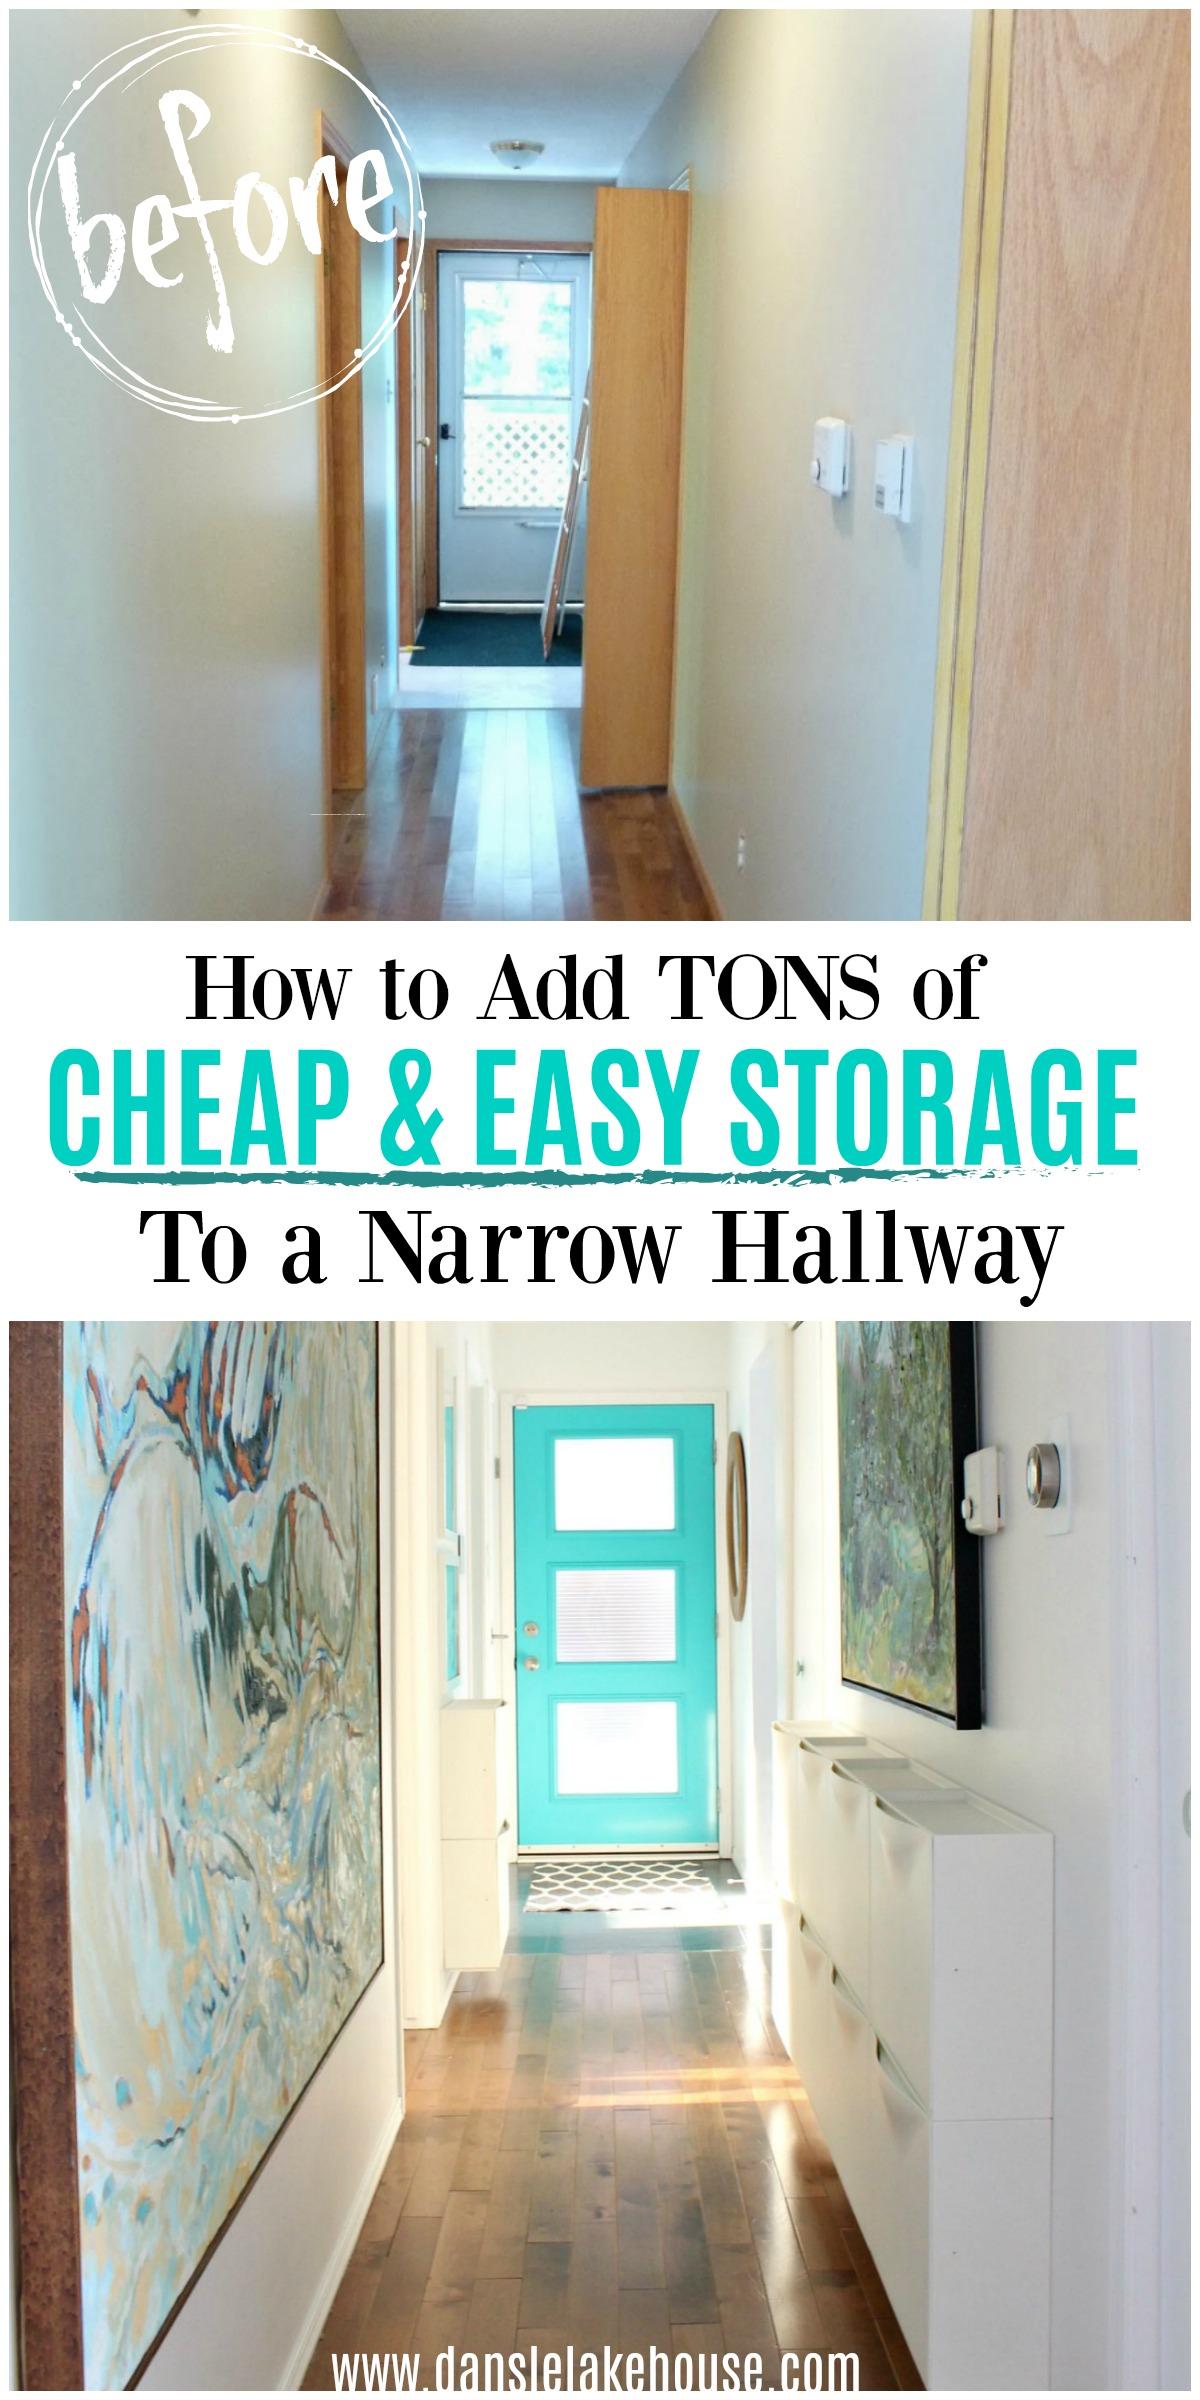 How to Add Cheap & Easy Storage to a Narrow Hallway